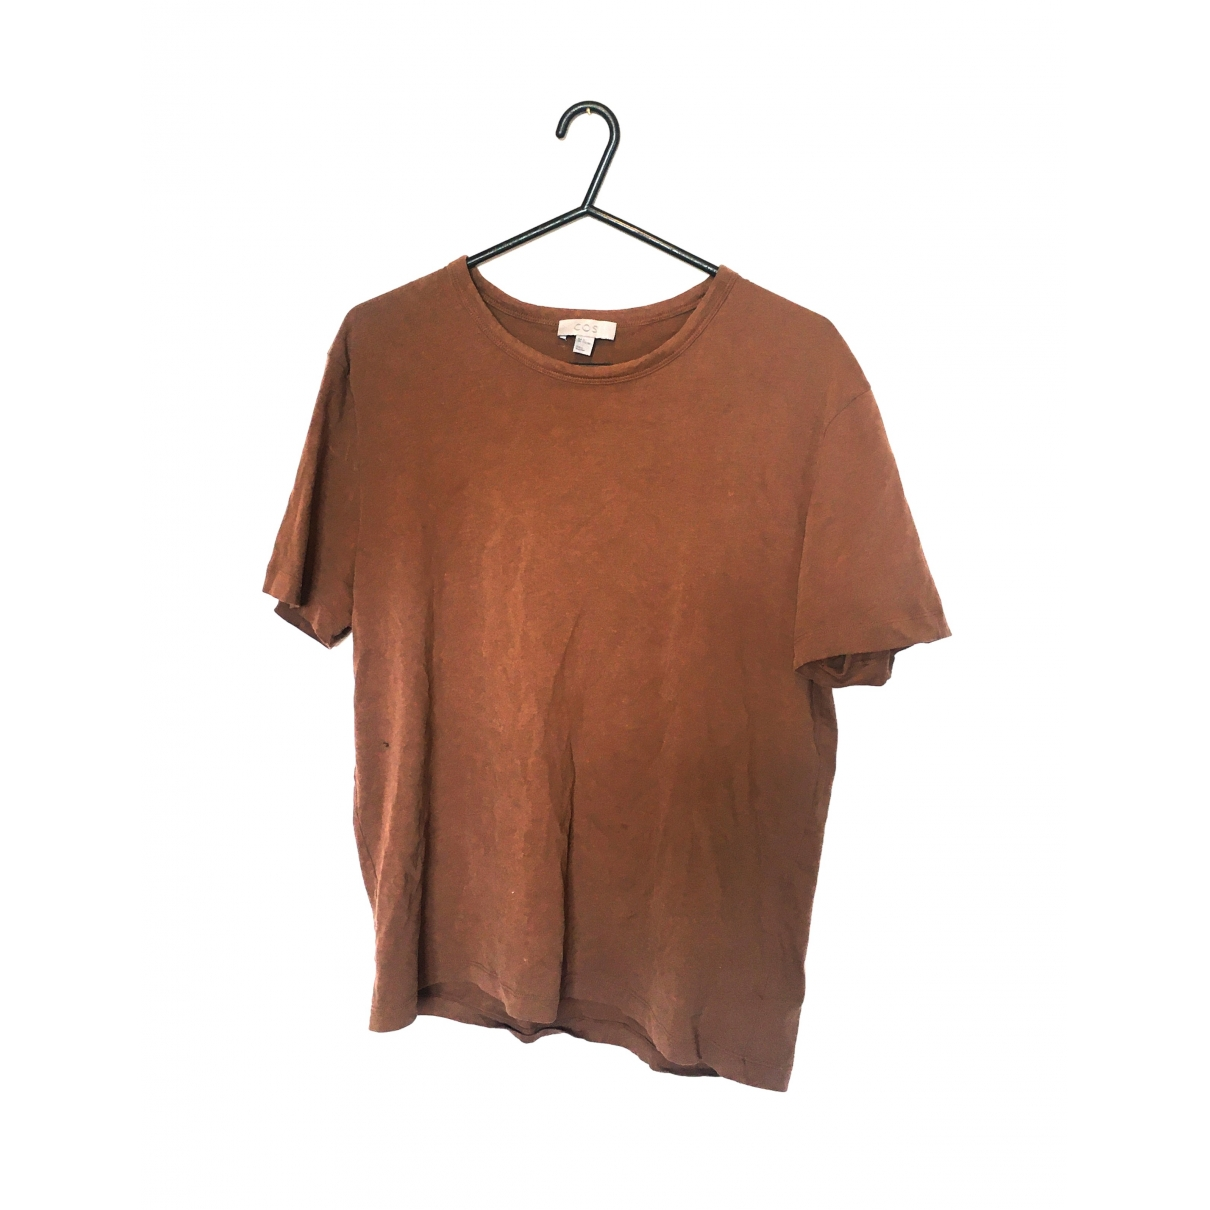 Cos \N Brown Cotton T-shirts for Men M International